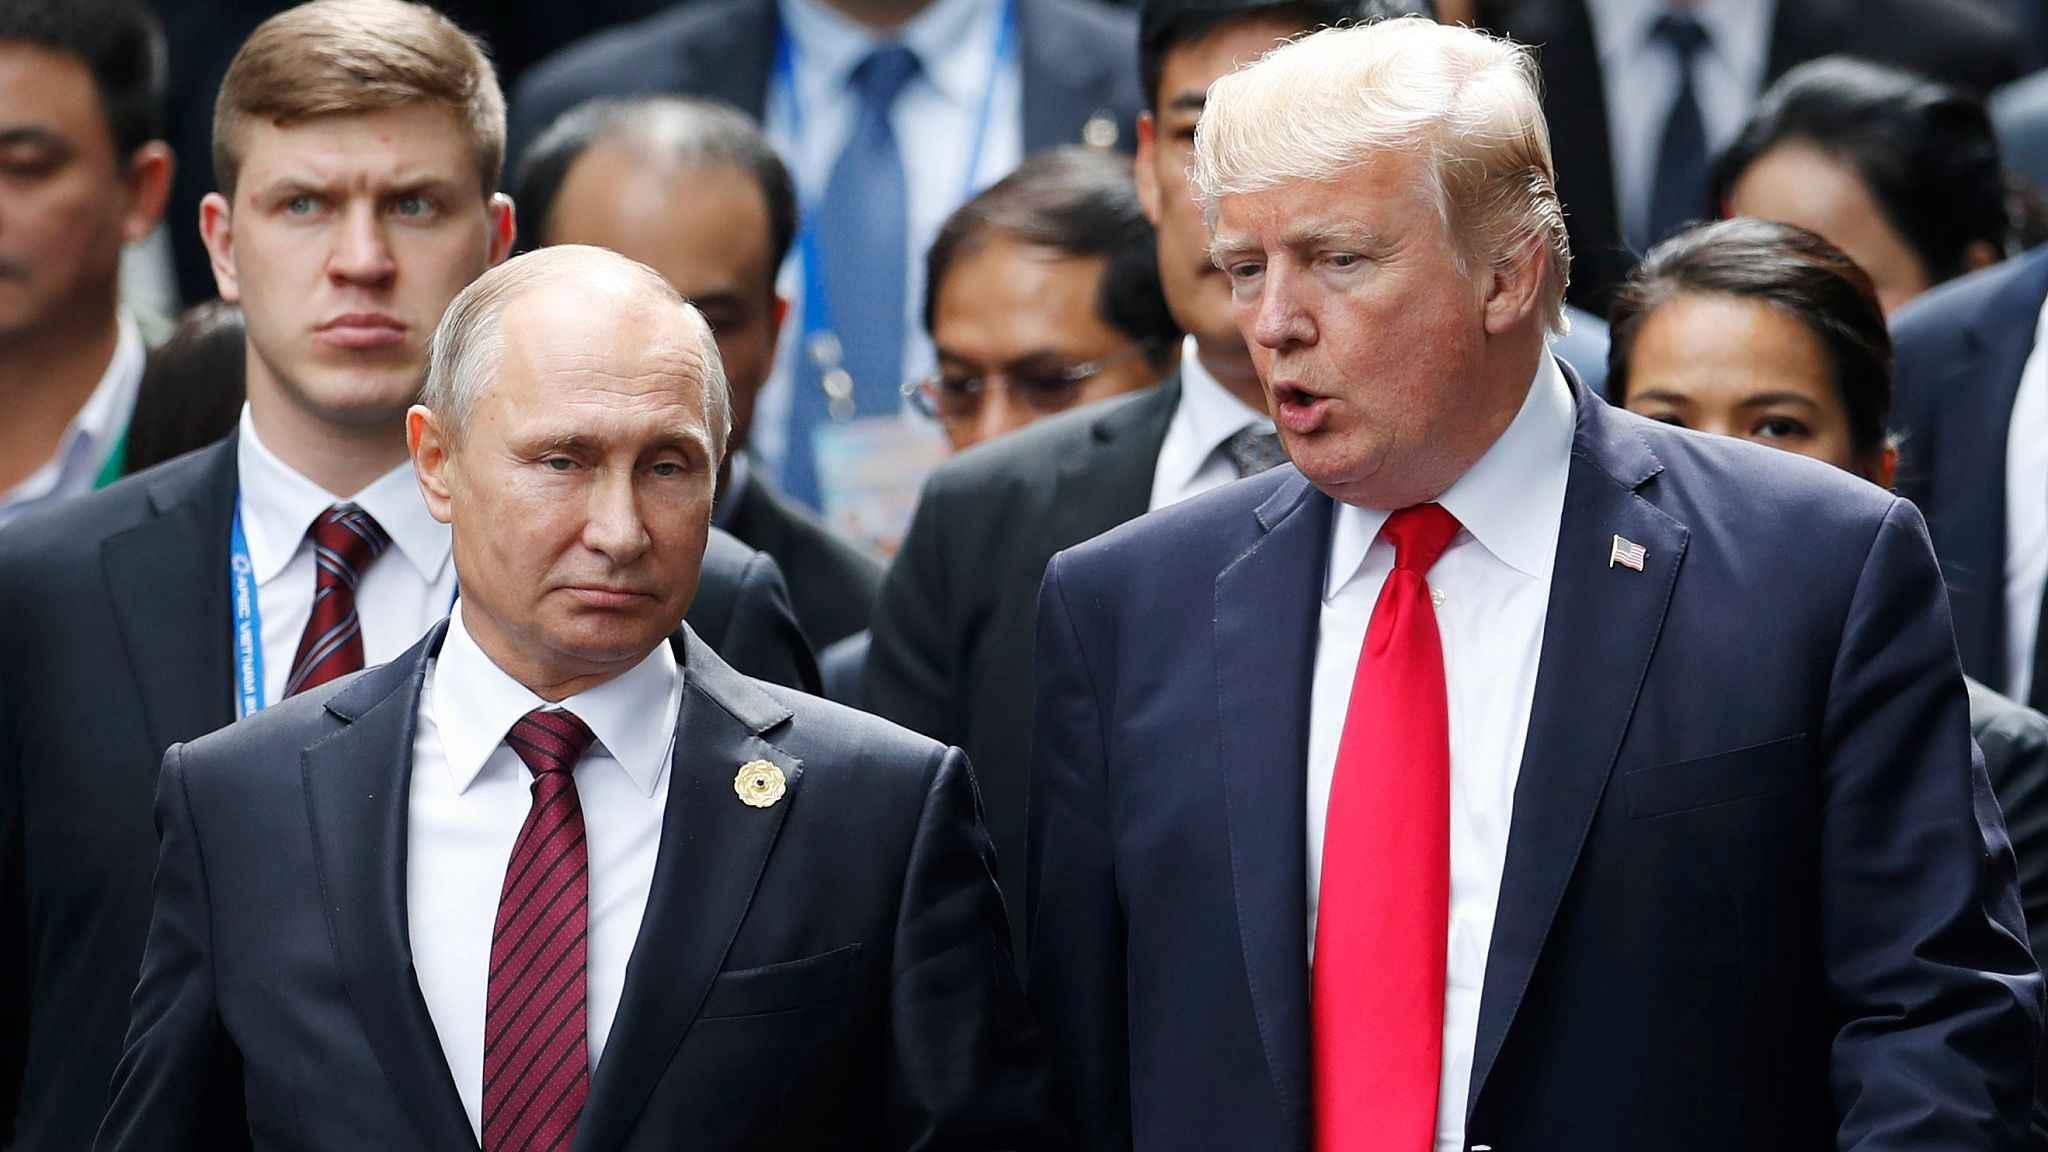 Opinion: Putin-Trump talks won't change adversarial Russia-US ties